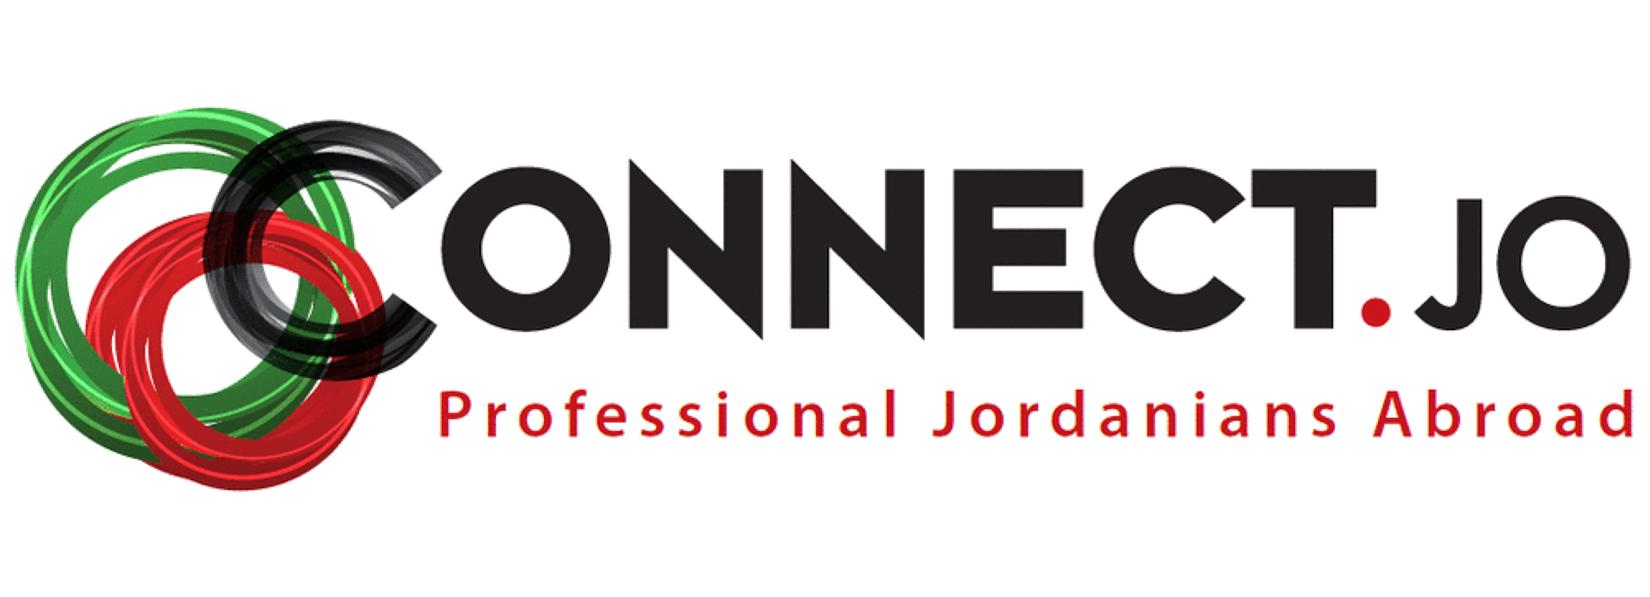 connect.jo squarespace.png